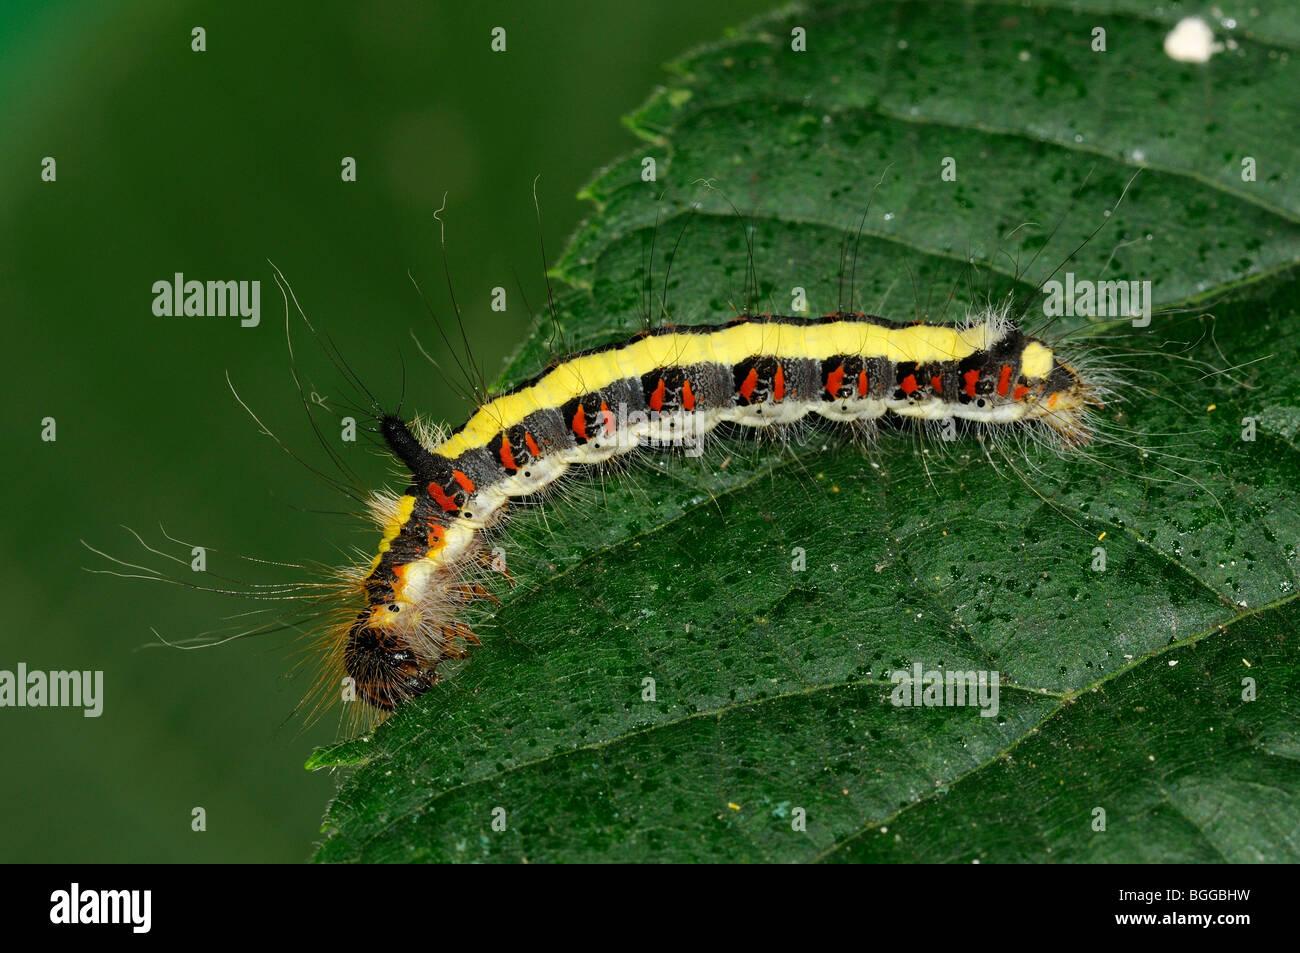 Caterpillar of Grey Dagger Moth (Acronicta psi) feeding on Lime tree leaf, Oxfordshire, UK. - Stock Image